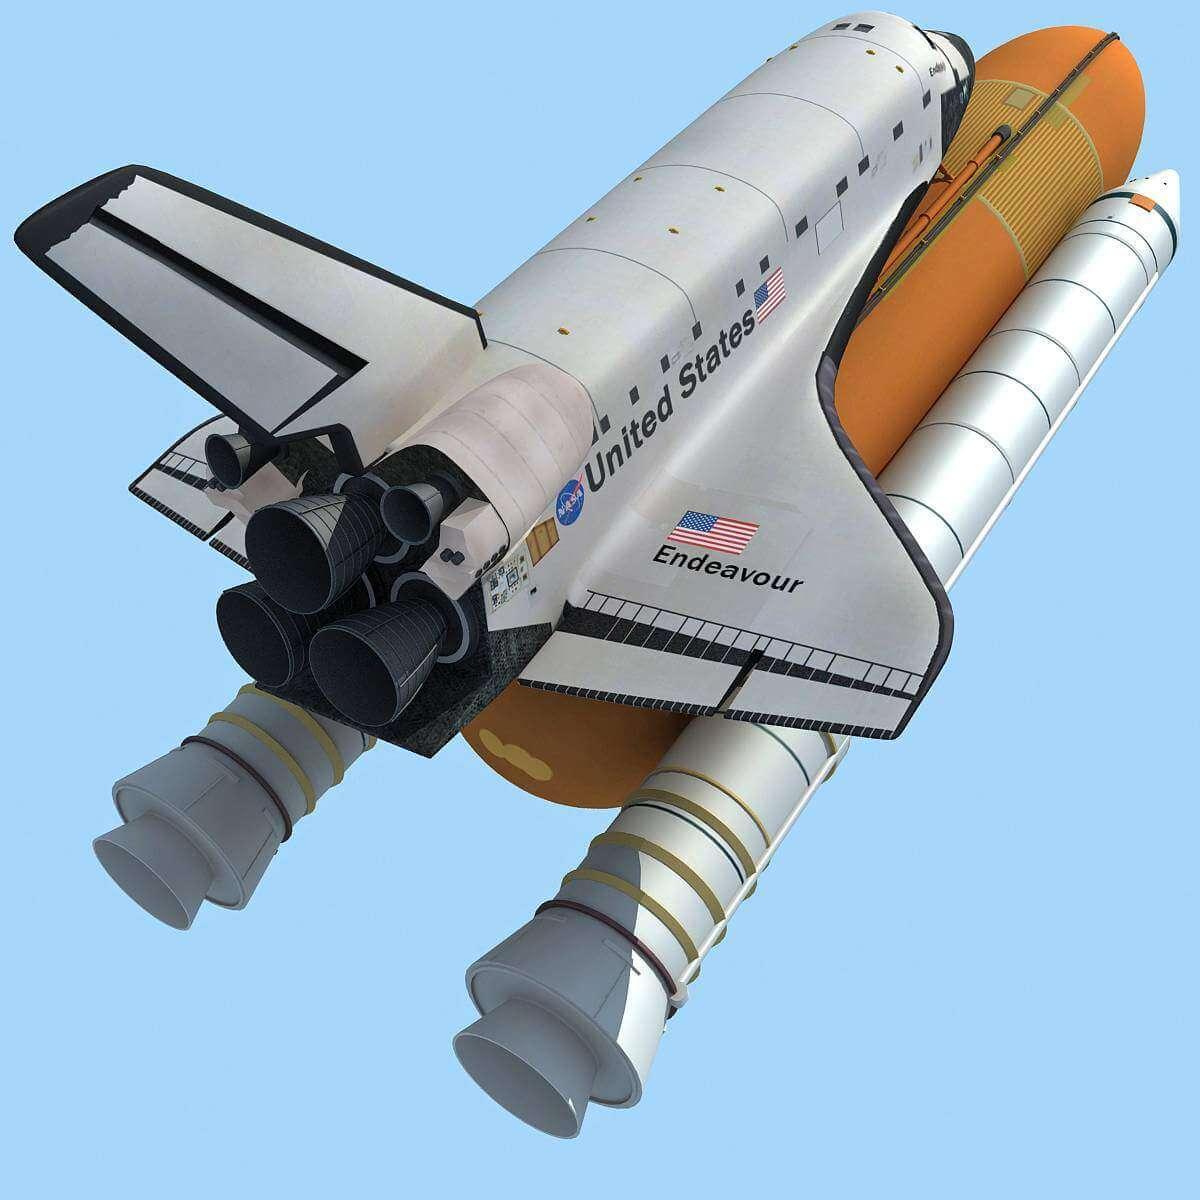 space shuttle horses arse - photo #37